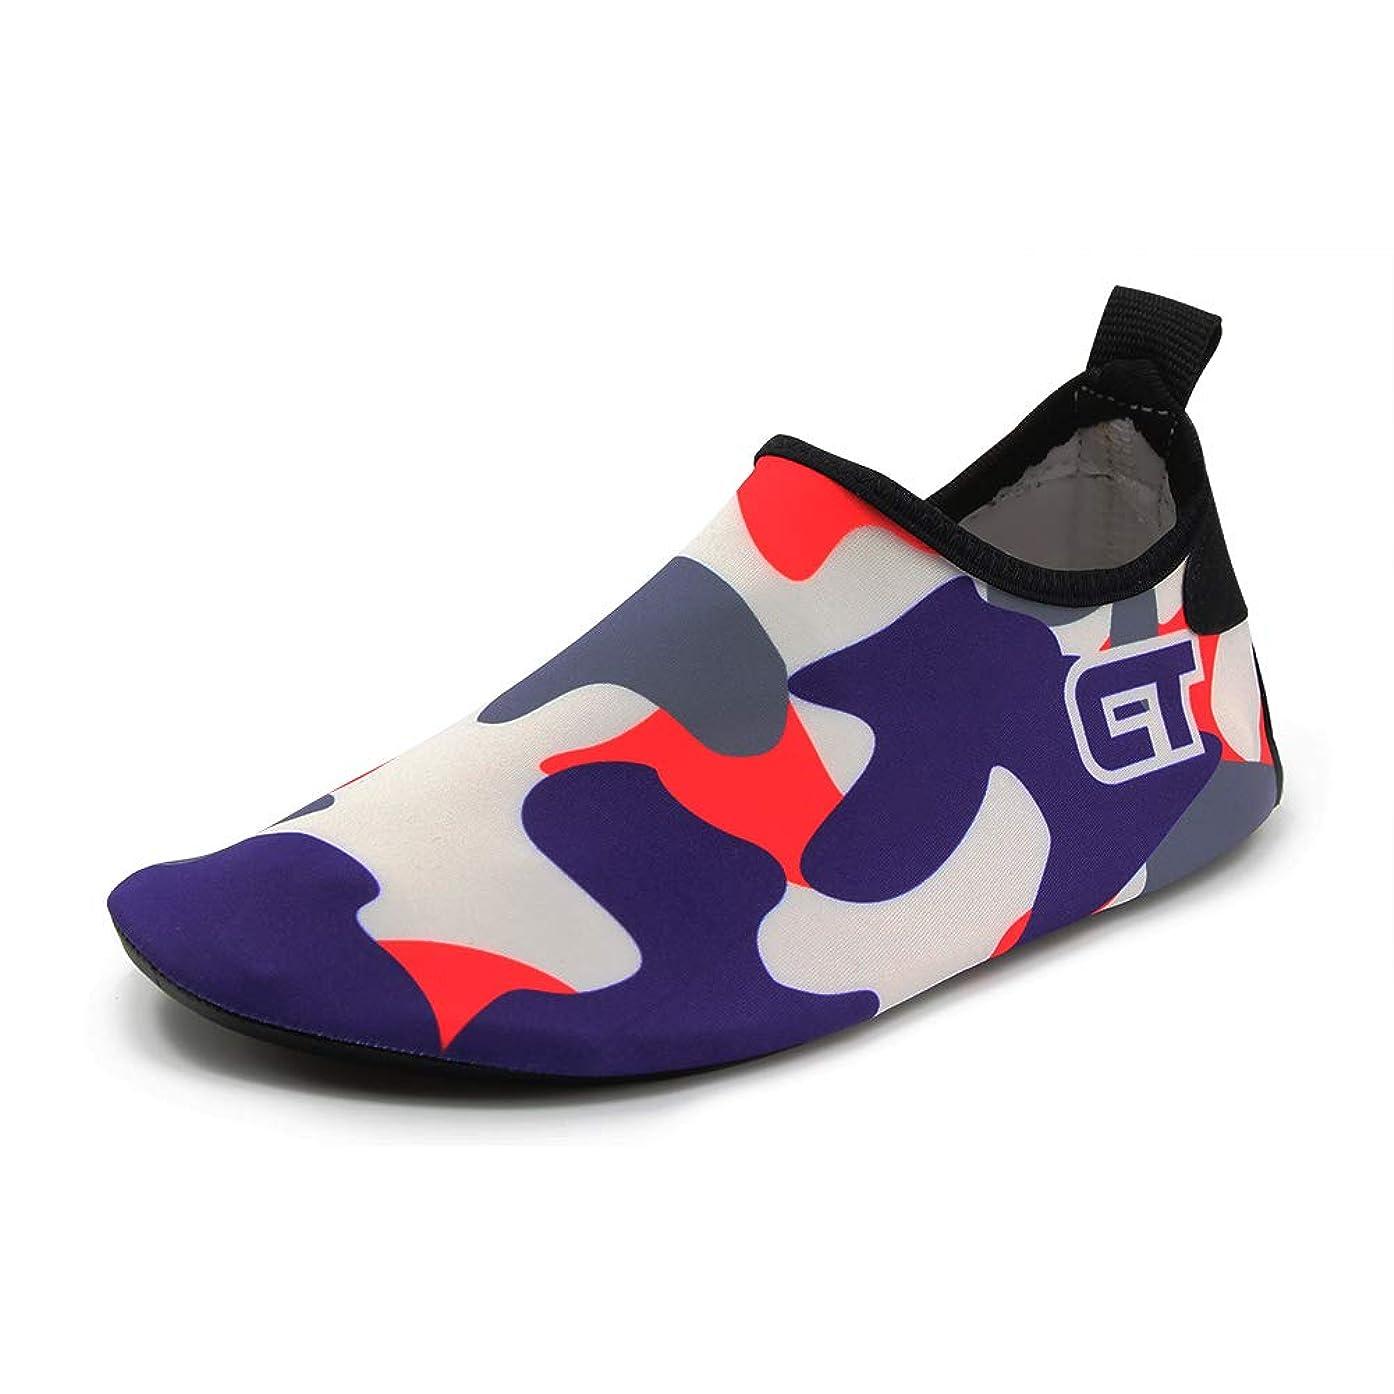 Chiximaxu Kids Water Sports Shoes Barefoot Aqua Socks for Swimming Pool Beach Run